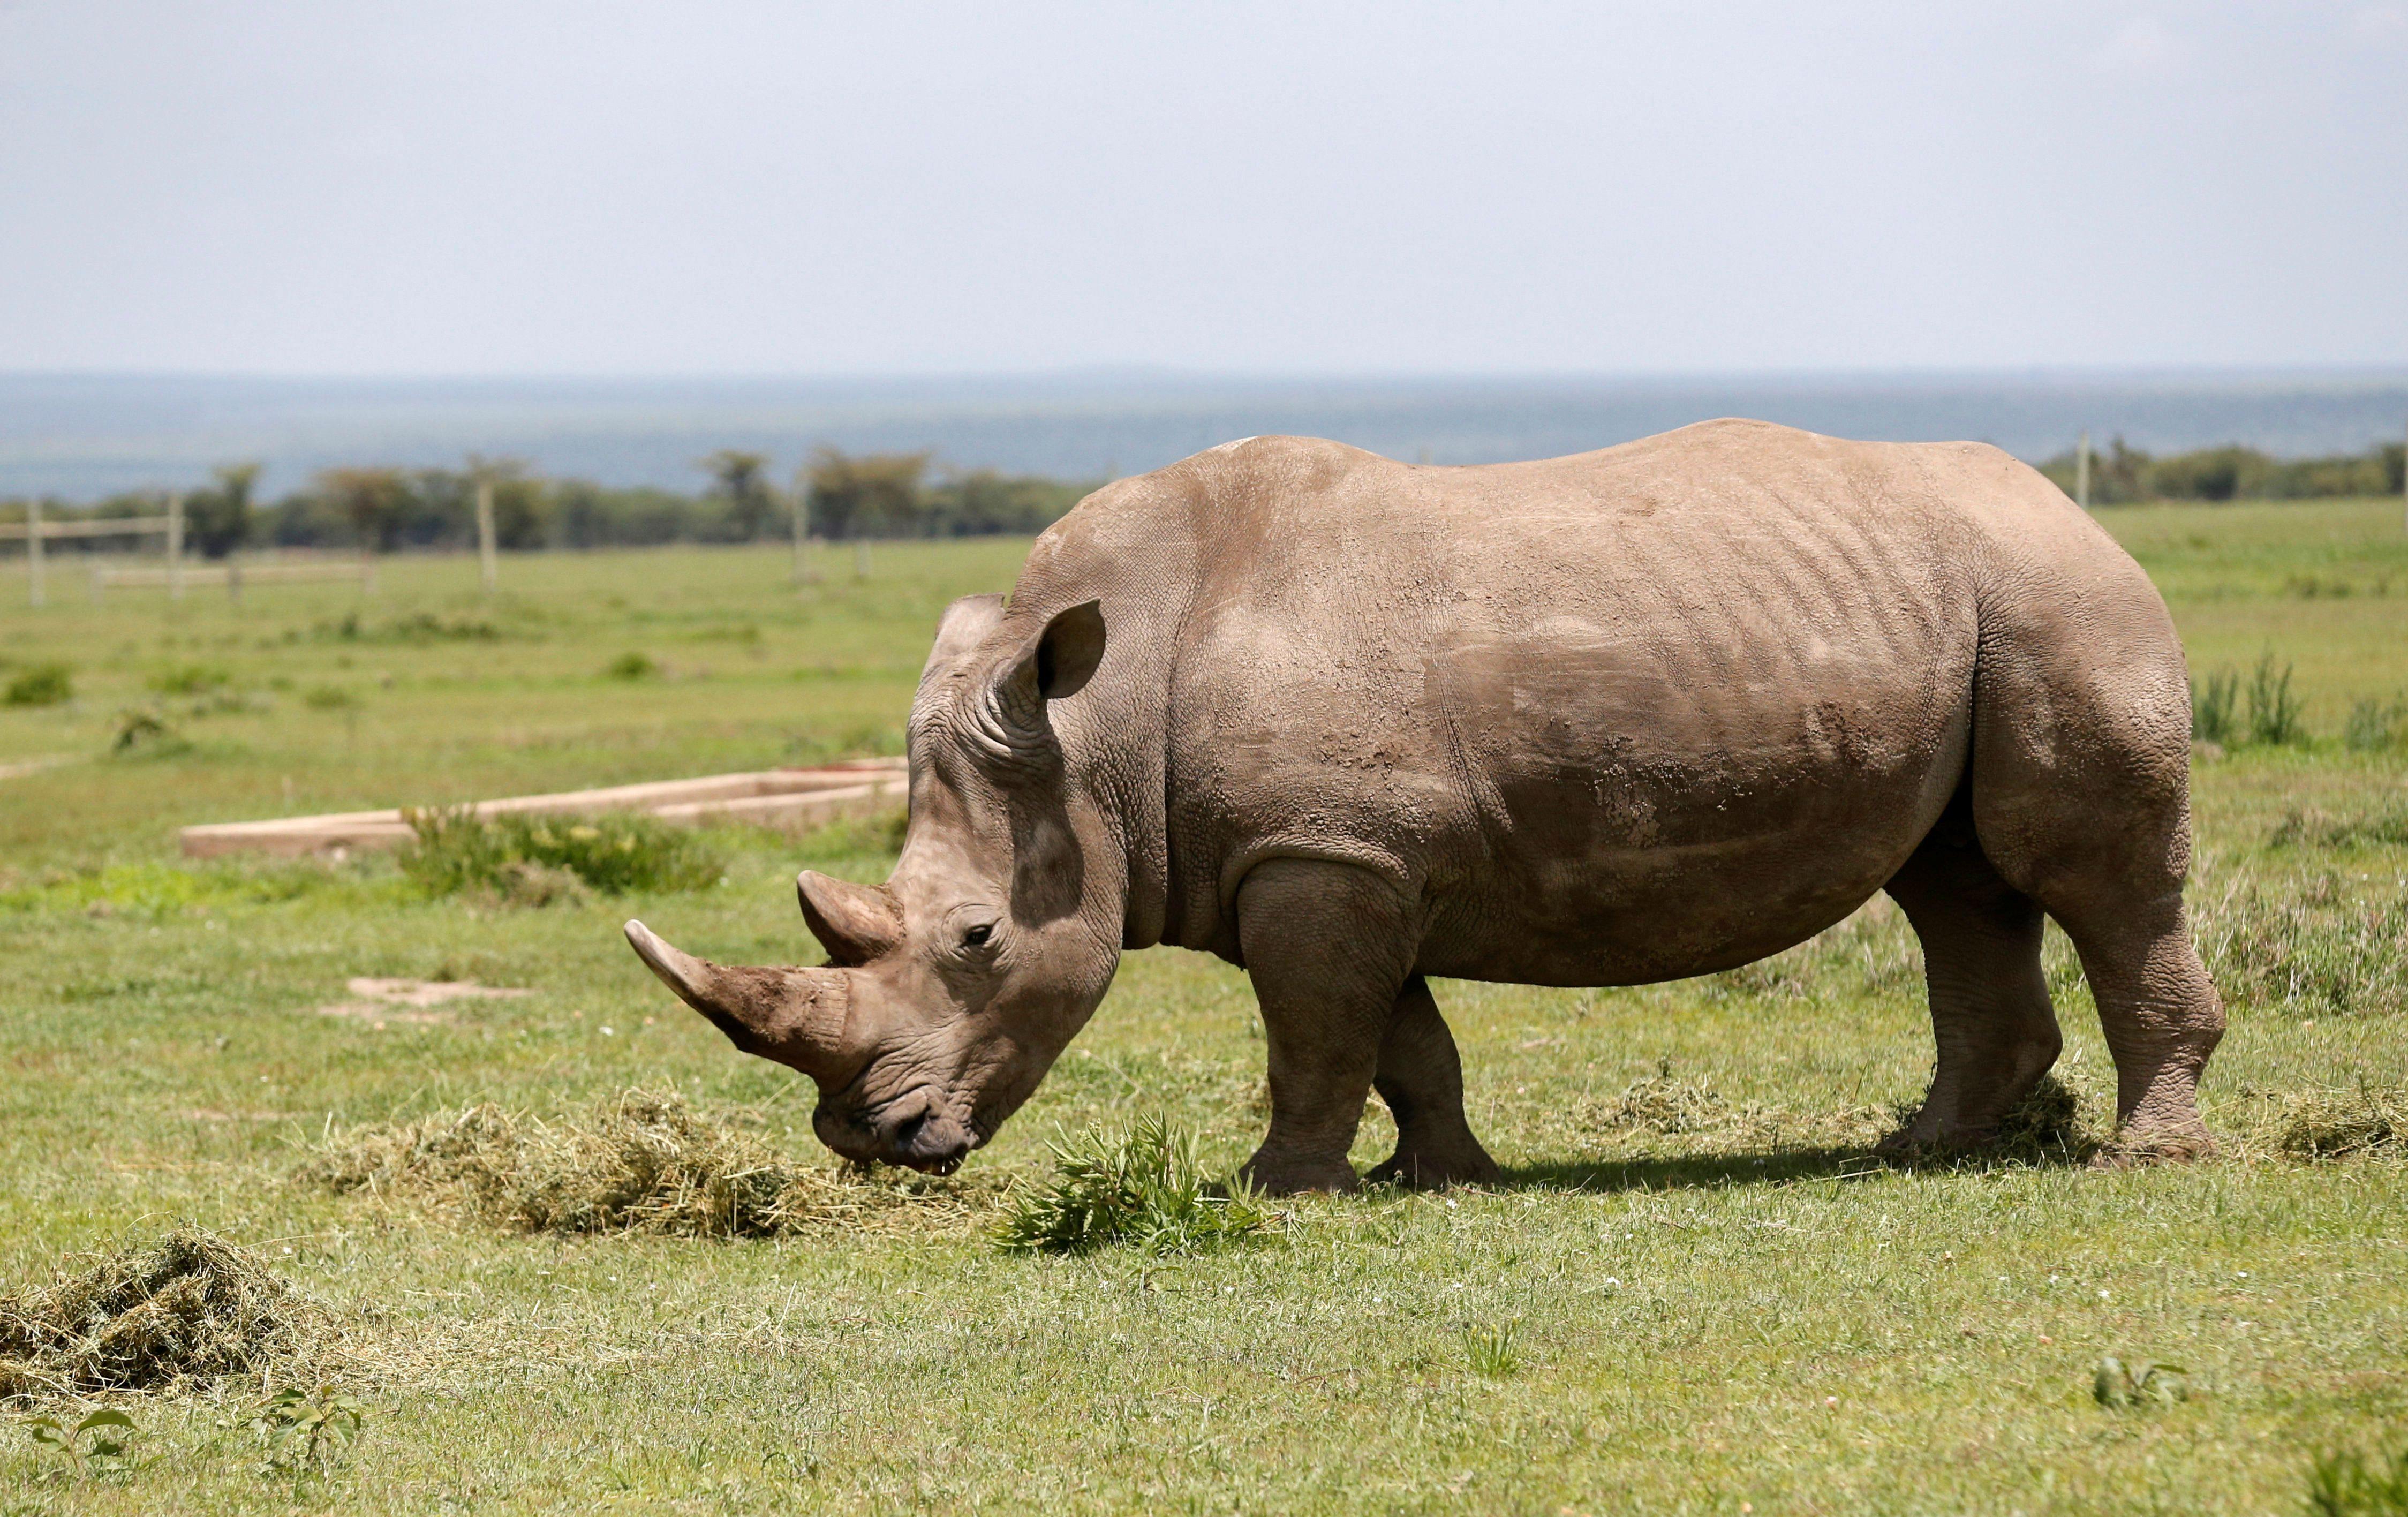 Ndauwo, a female southern white rhino grazes near the enclosure at the Ol Pejeta Conservancy in Laikipia National Park, Kenya March 31, 2018. REUTERS/Thomas Mukoya - RC142B7FFA00